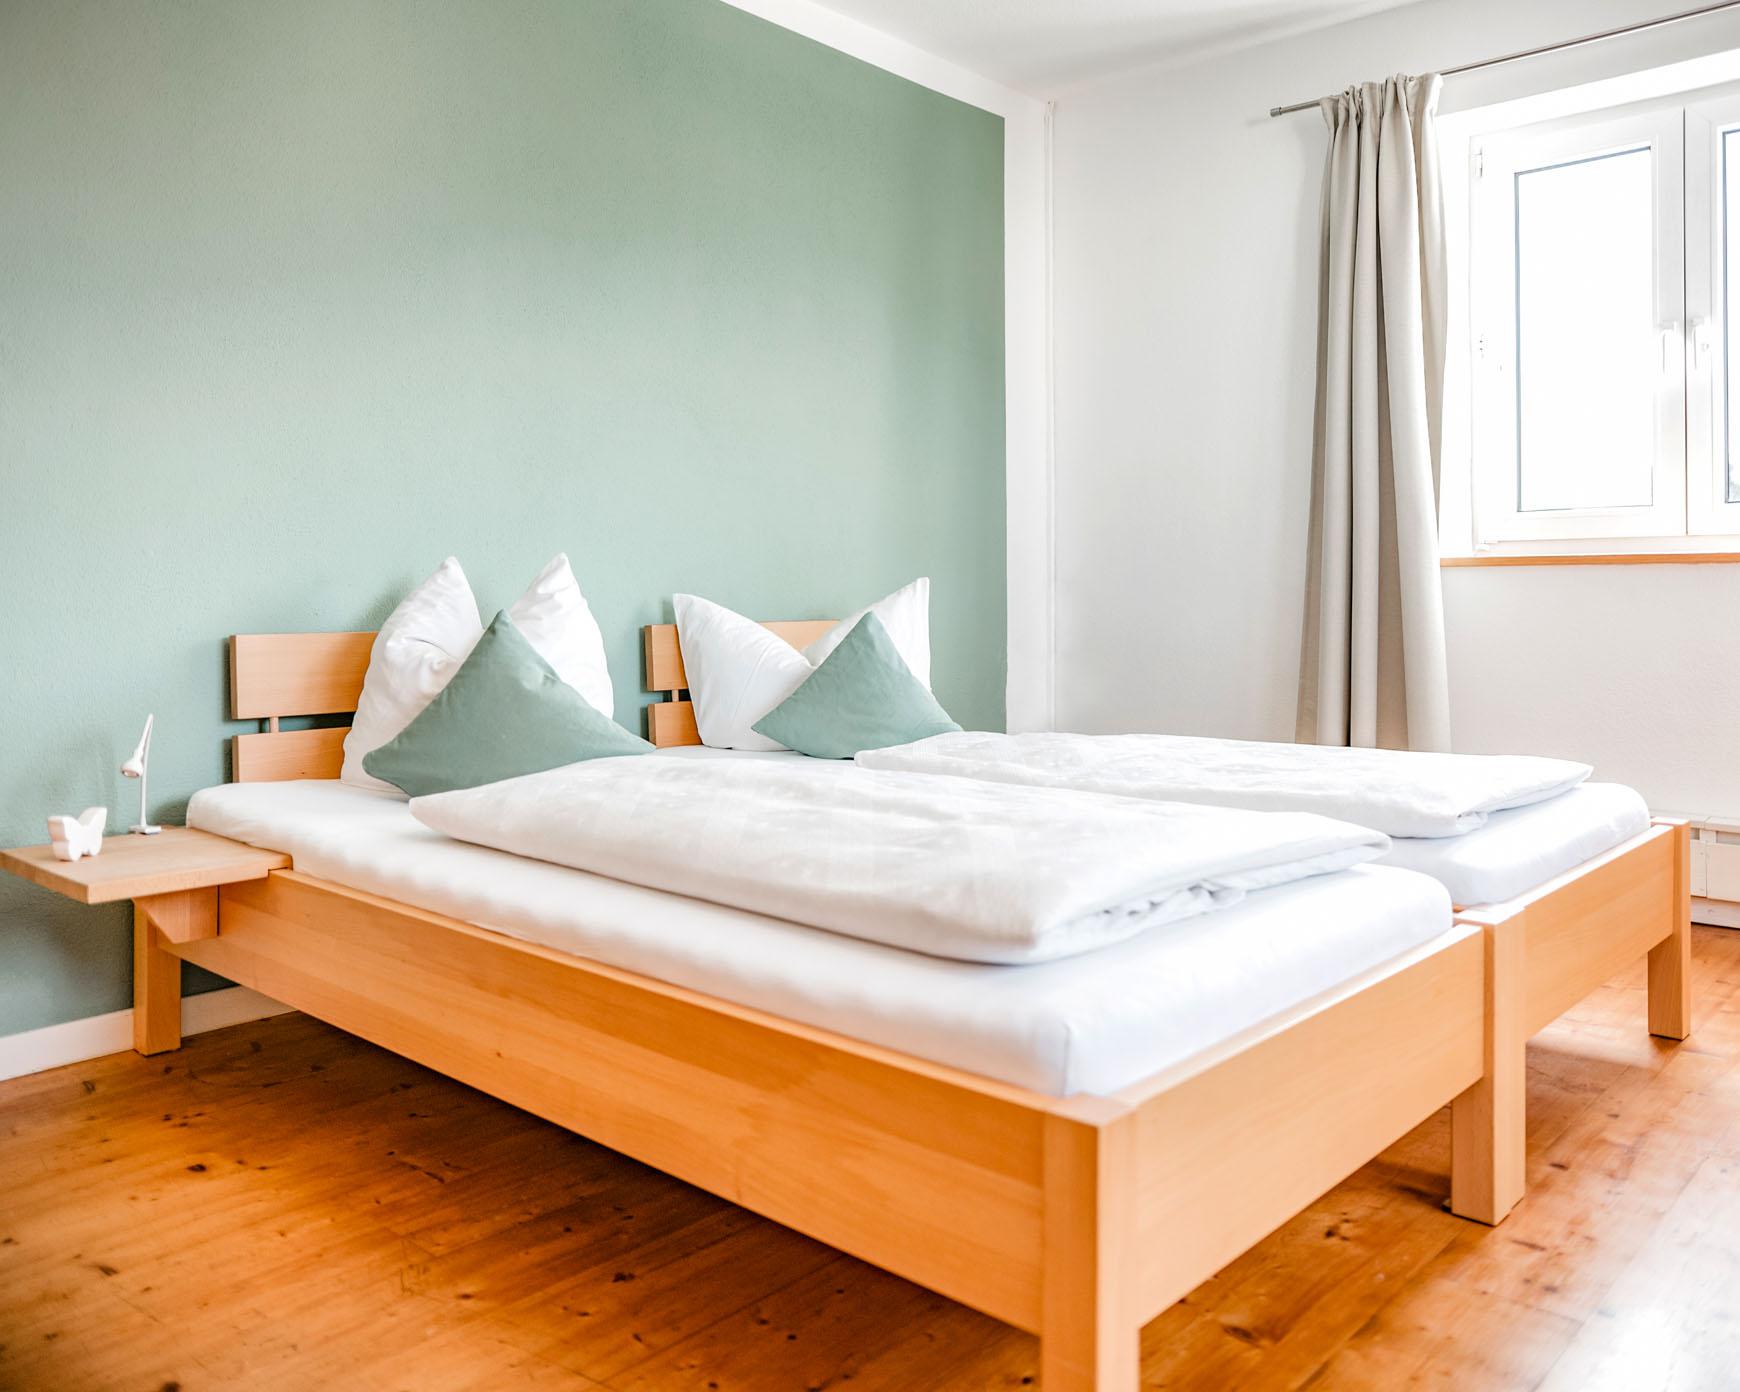 Doppelzimmer - Betten